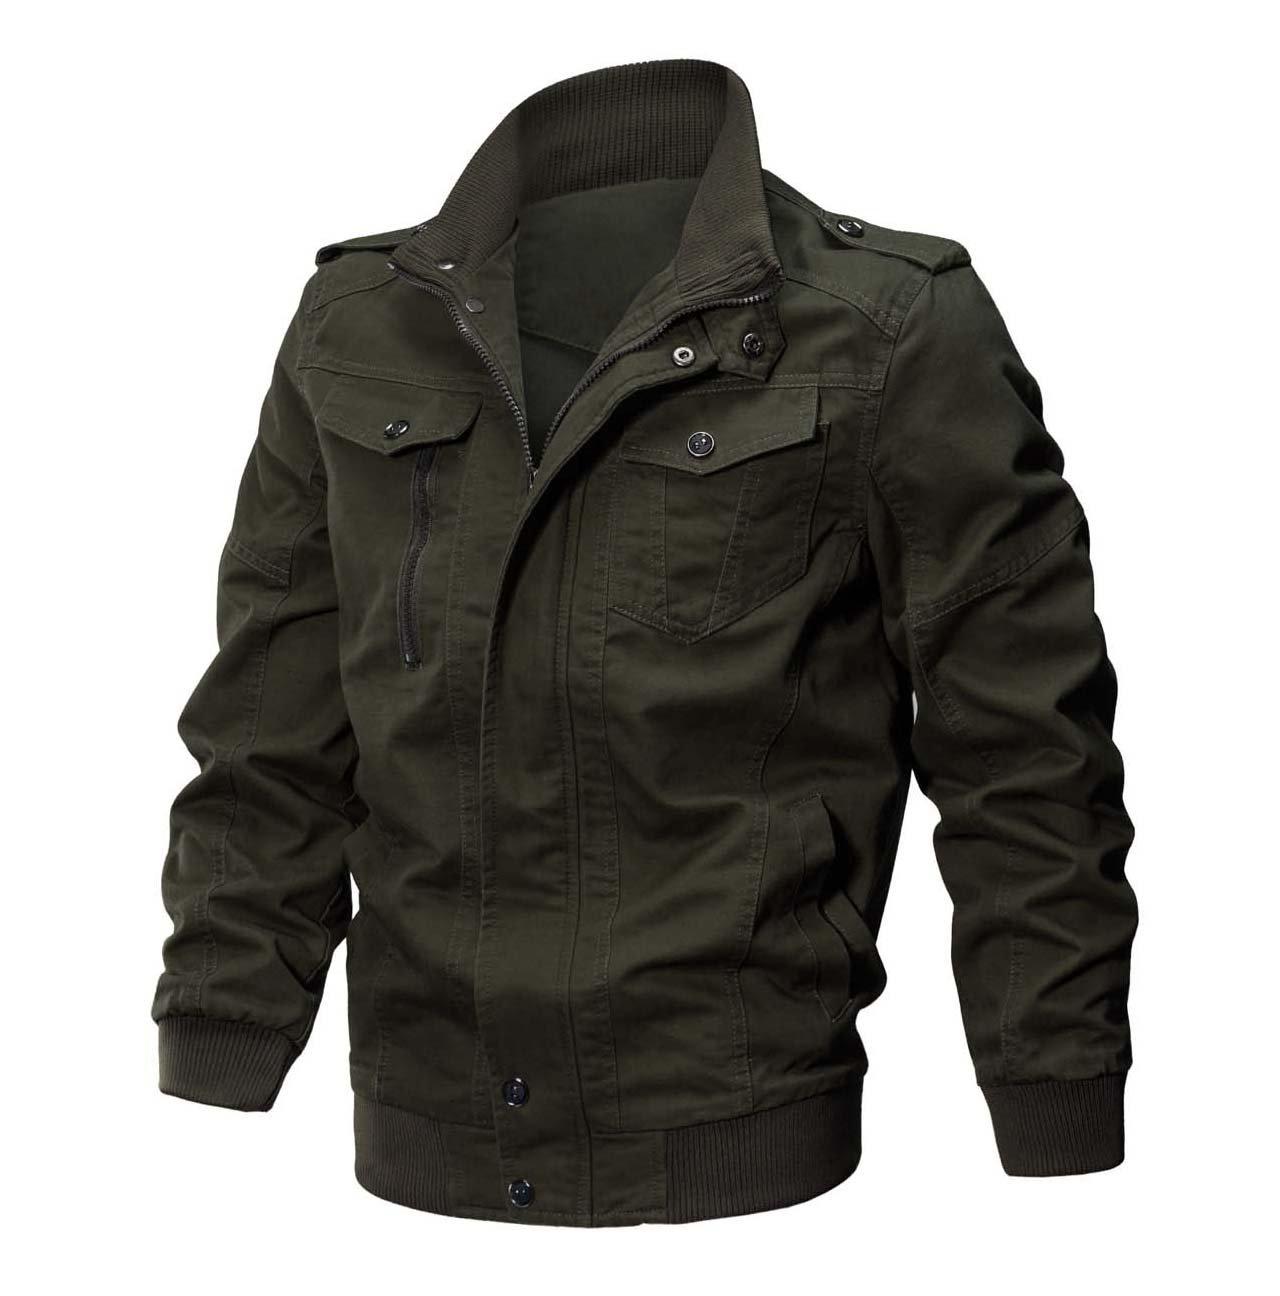 CRYSULLY Men's Flying Jacket Tactical Safari Jacket Cotton Field Military Cargo Jacket Coat Army Green by CRYSULLY